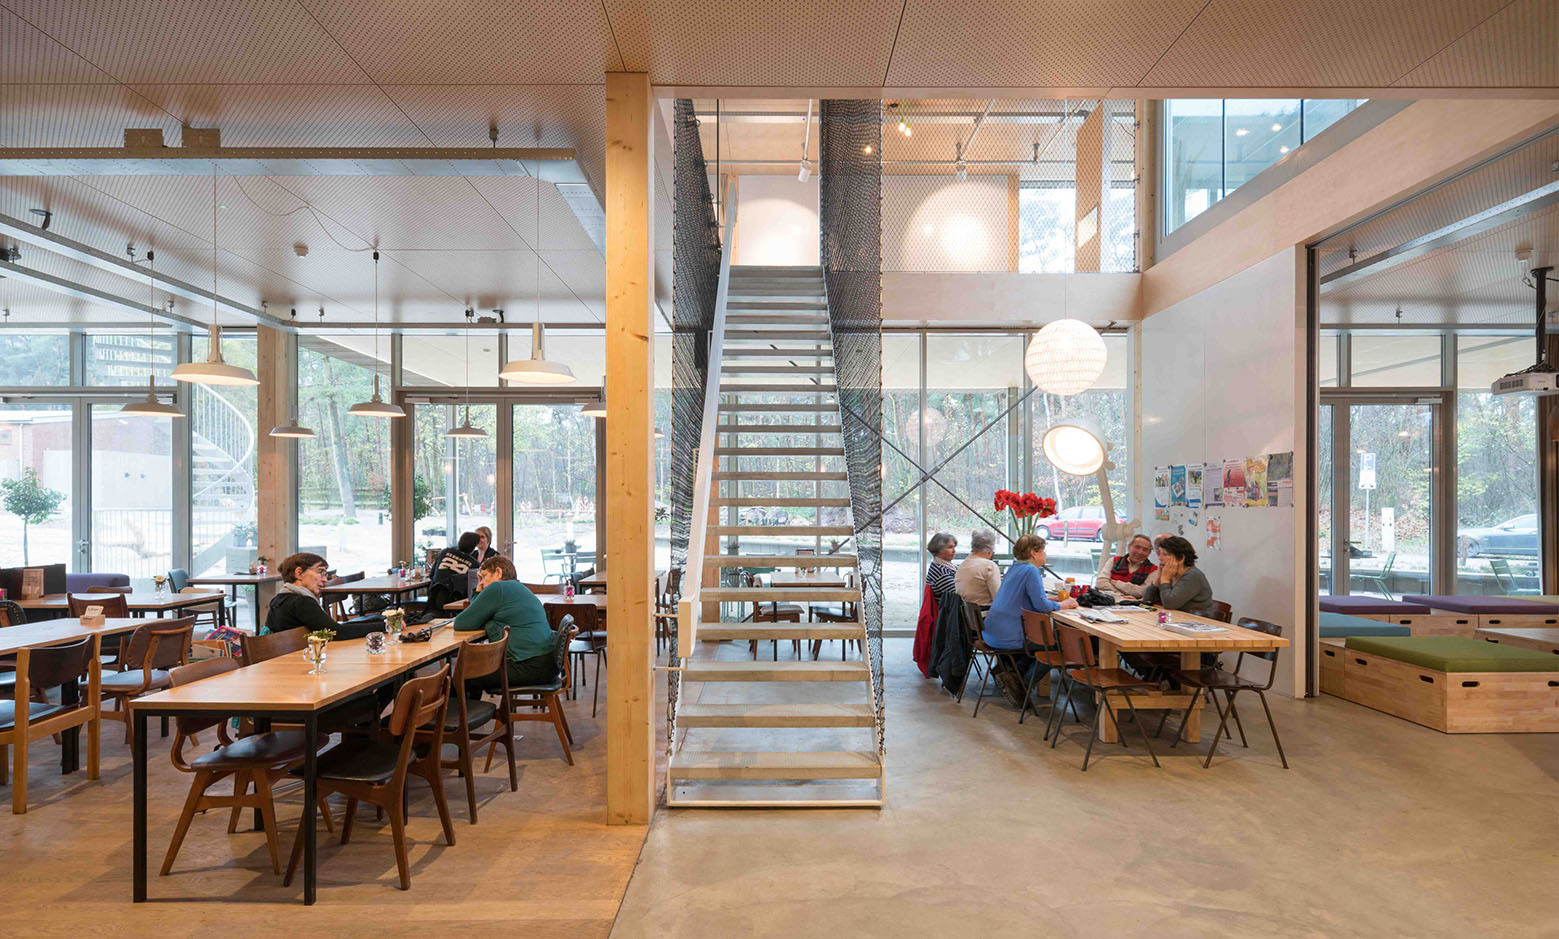 Gallery of Stayokay Hostel and Natuurpodium / Personal Architecture - 8